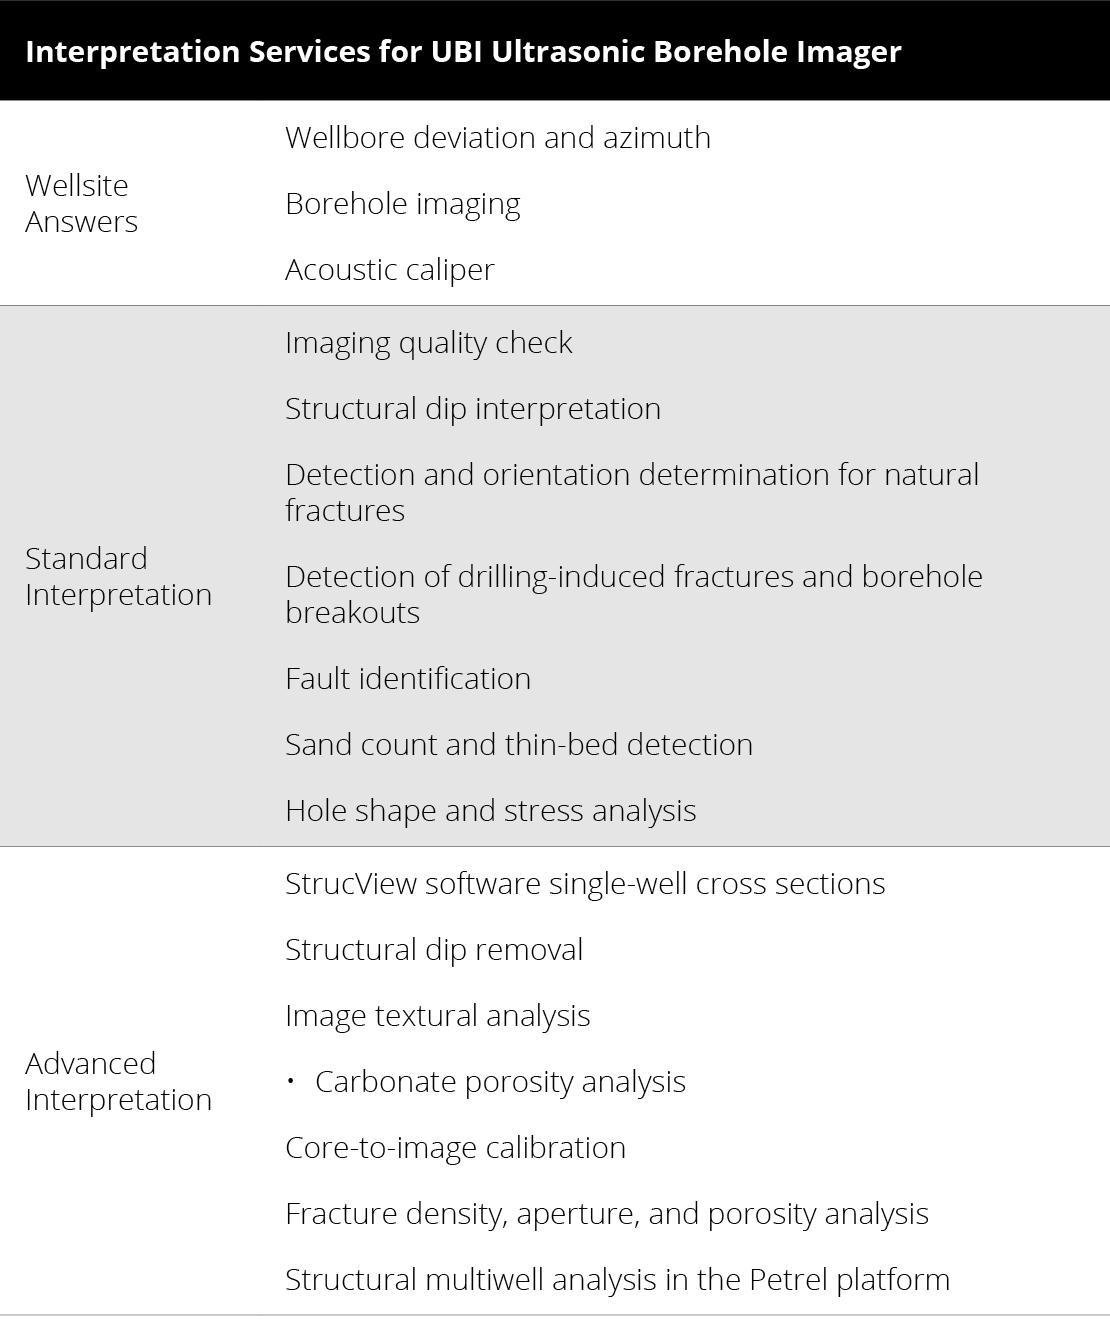 Interpretation Services for UBI Ultrasonic Borehole Imager